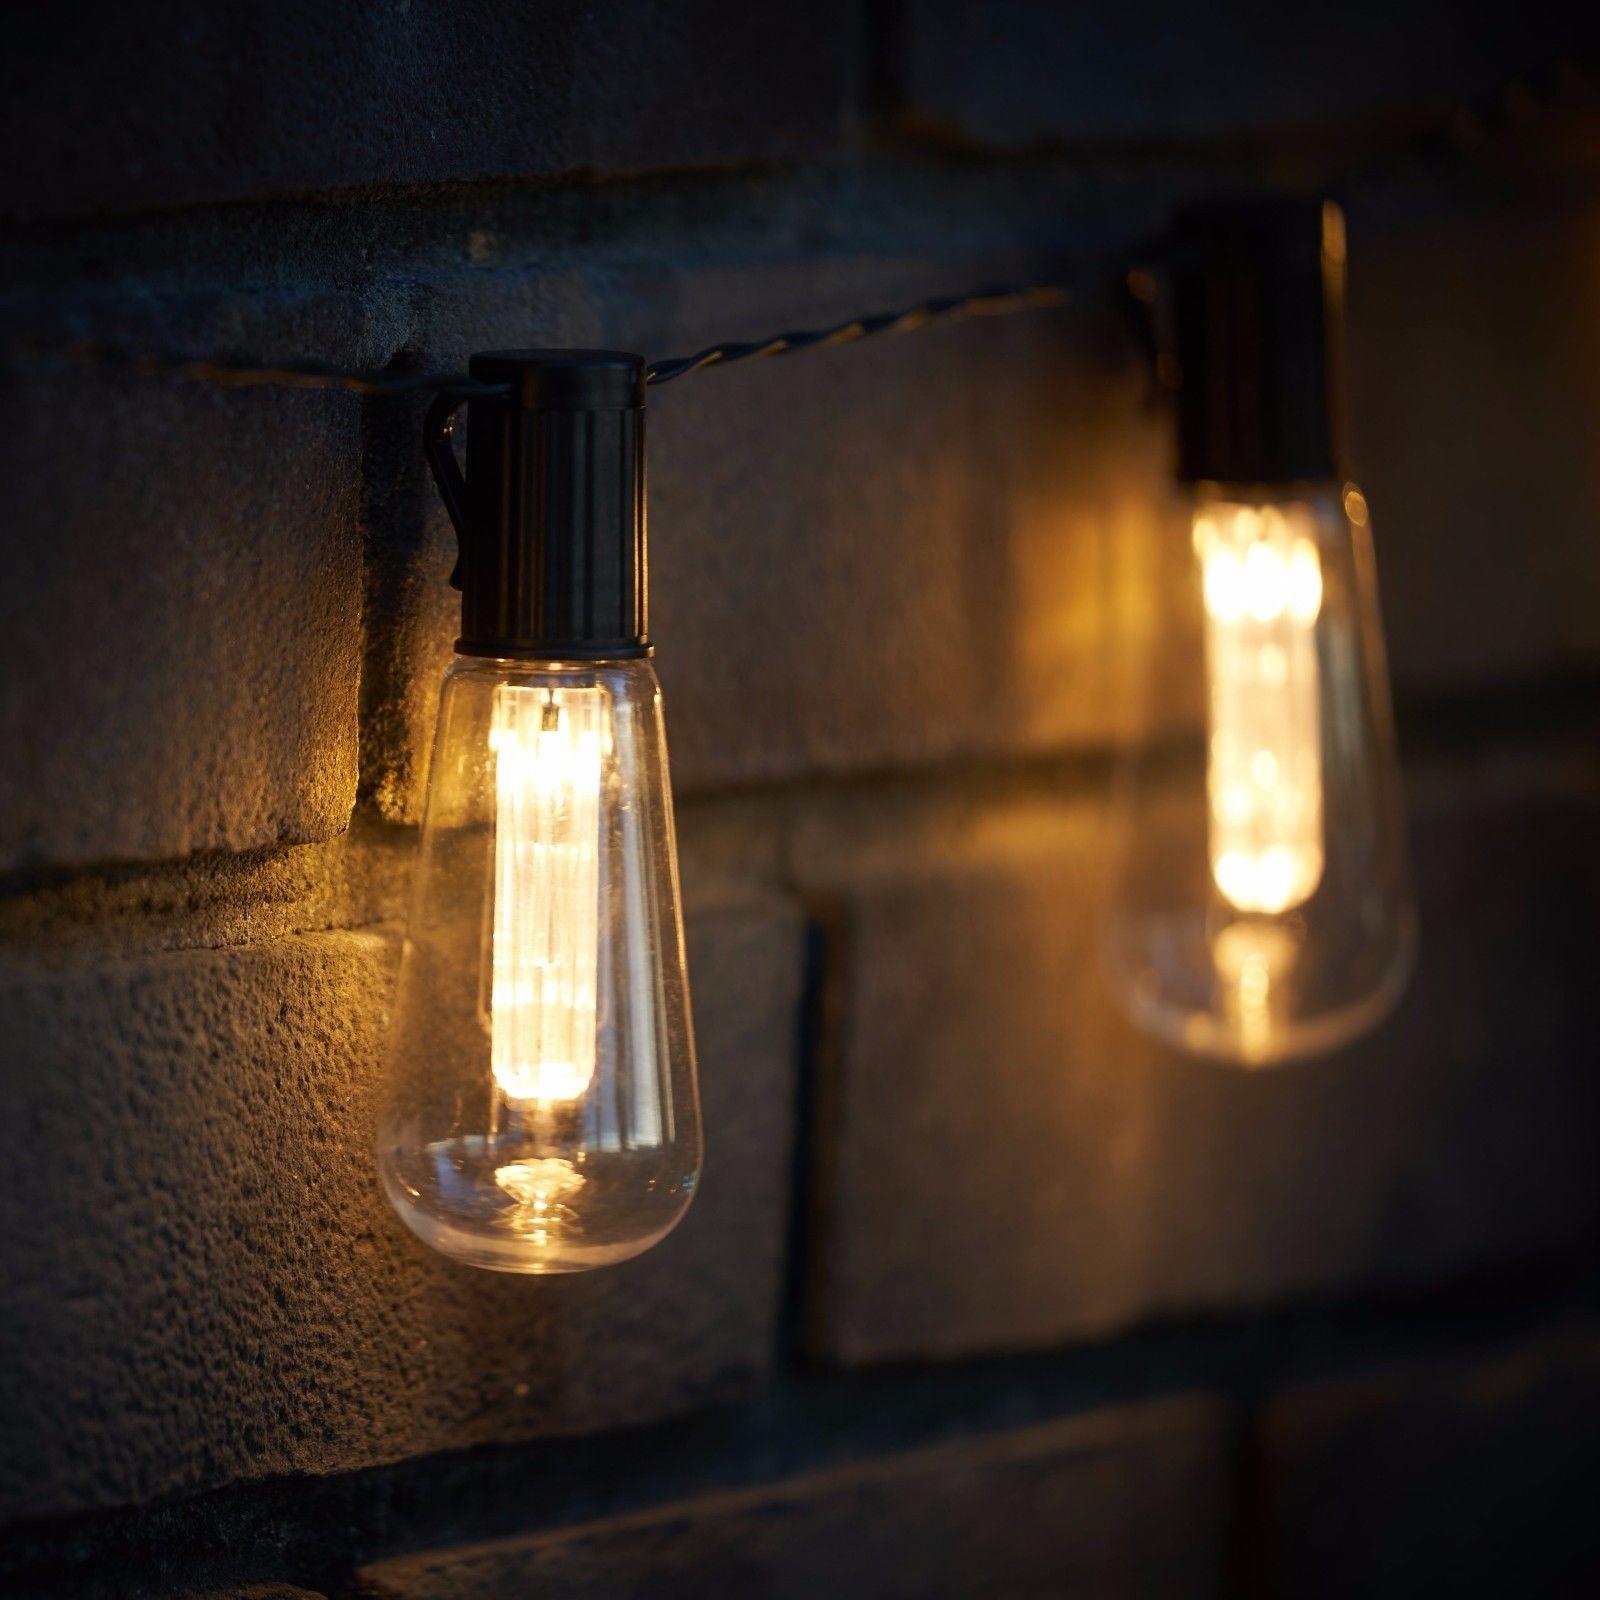 sale retailer 017b2 e62f3 LED SOLAR POWERED Vintage Edison Bulb String Lights Garden Outdoor Summer  Party